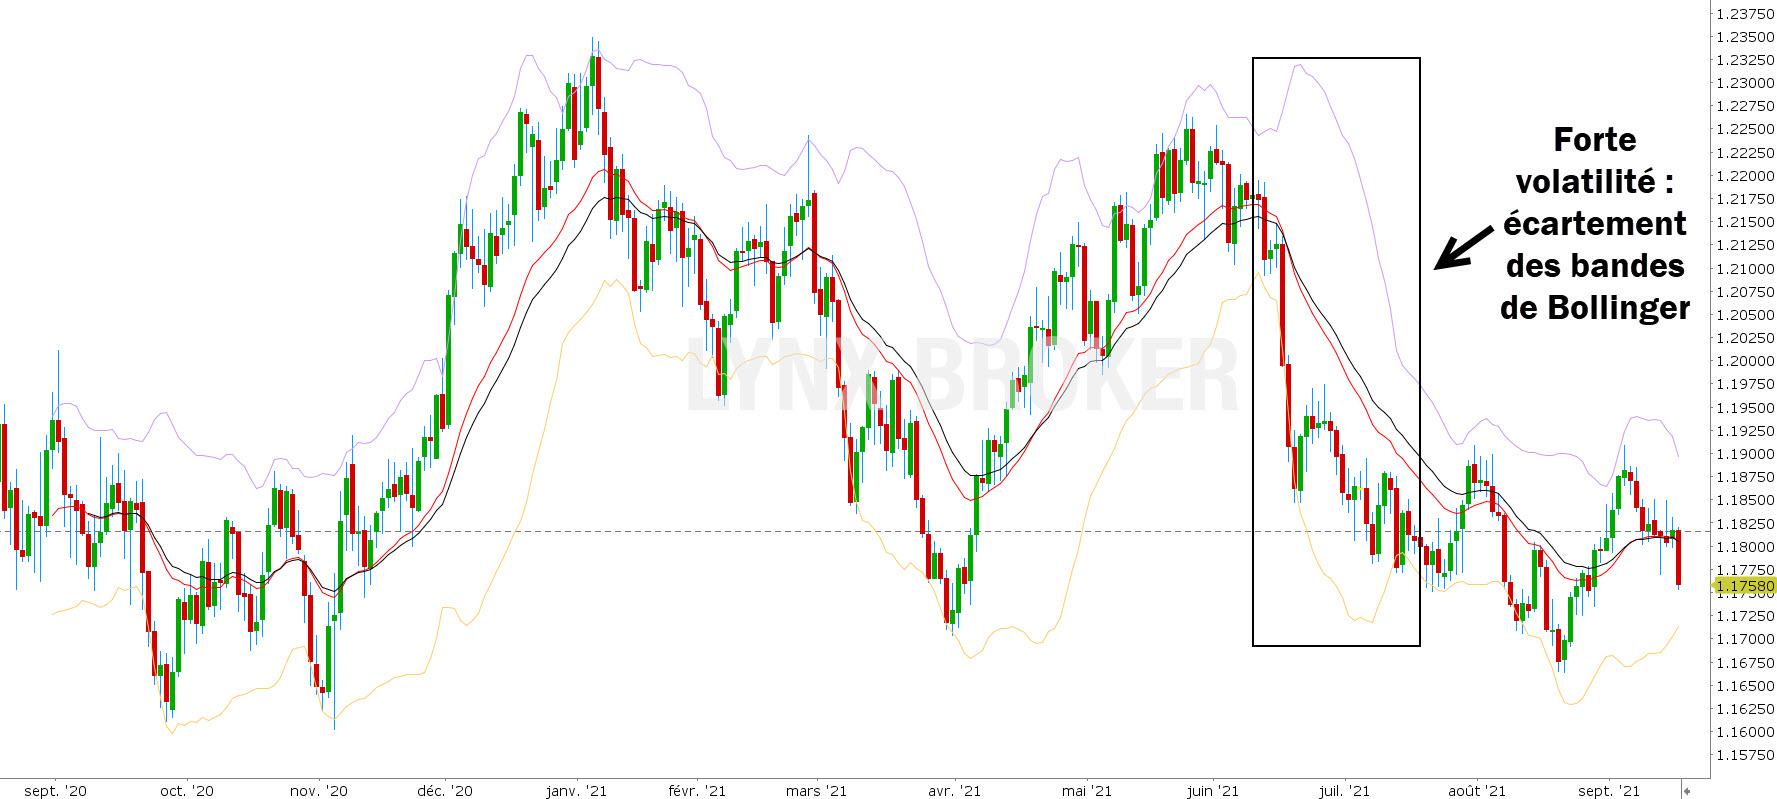 bandes de bollinger illustration volatilité EURUSD